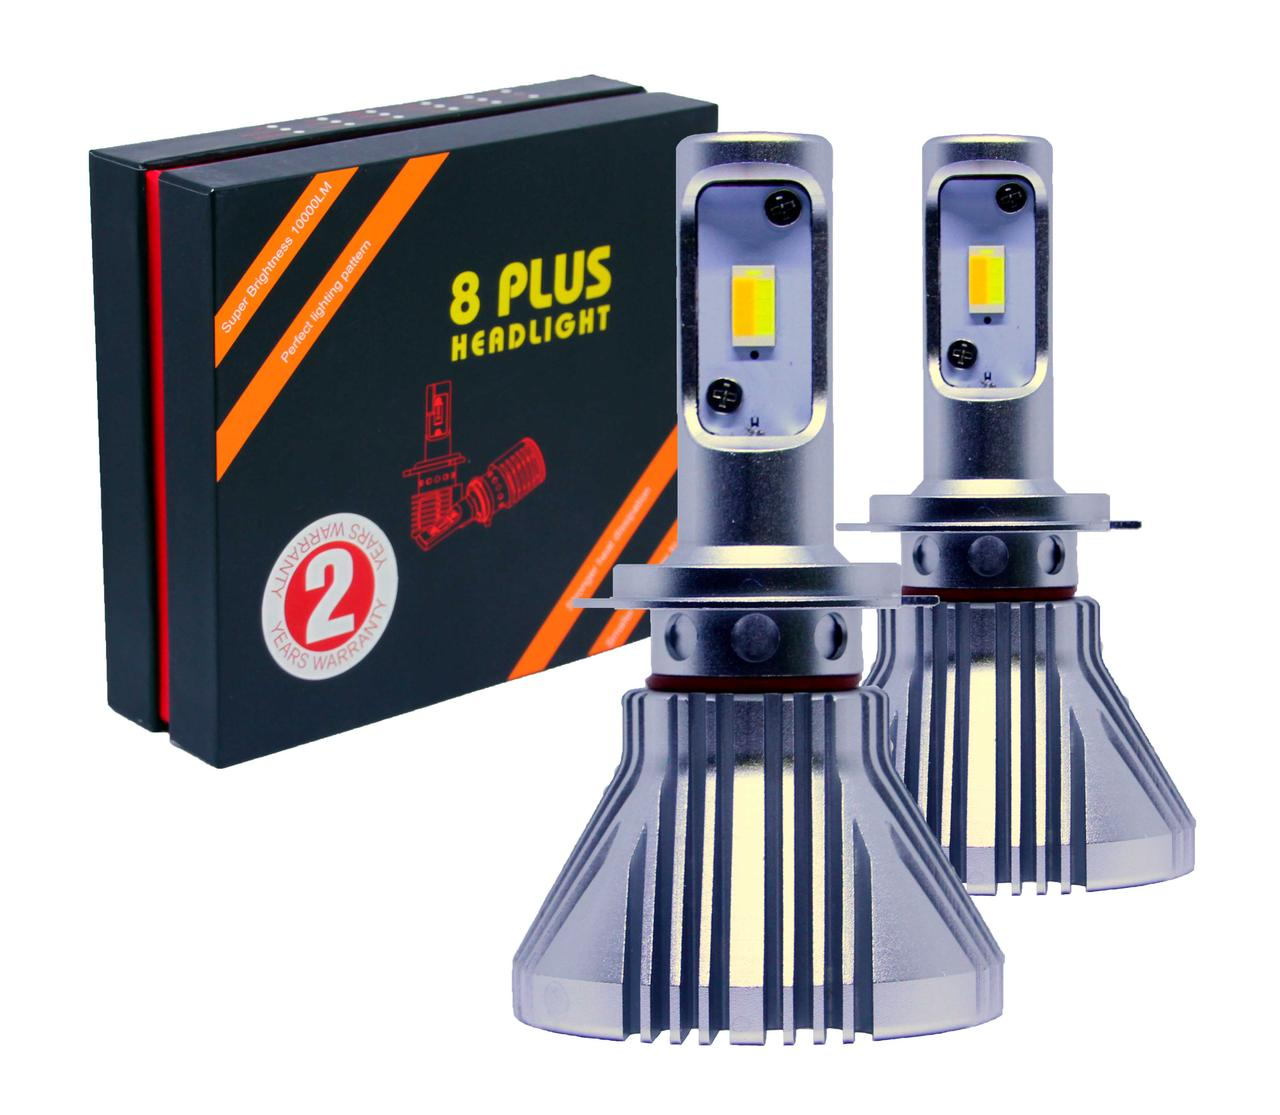 Лампа светодиодная для фар 8PLUS HEADLIGHT  H7  2800/4500/6000K 10000Lm, 2 шт/компл.